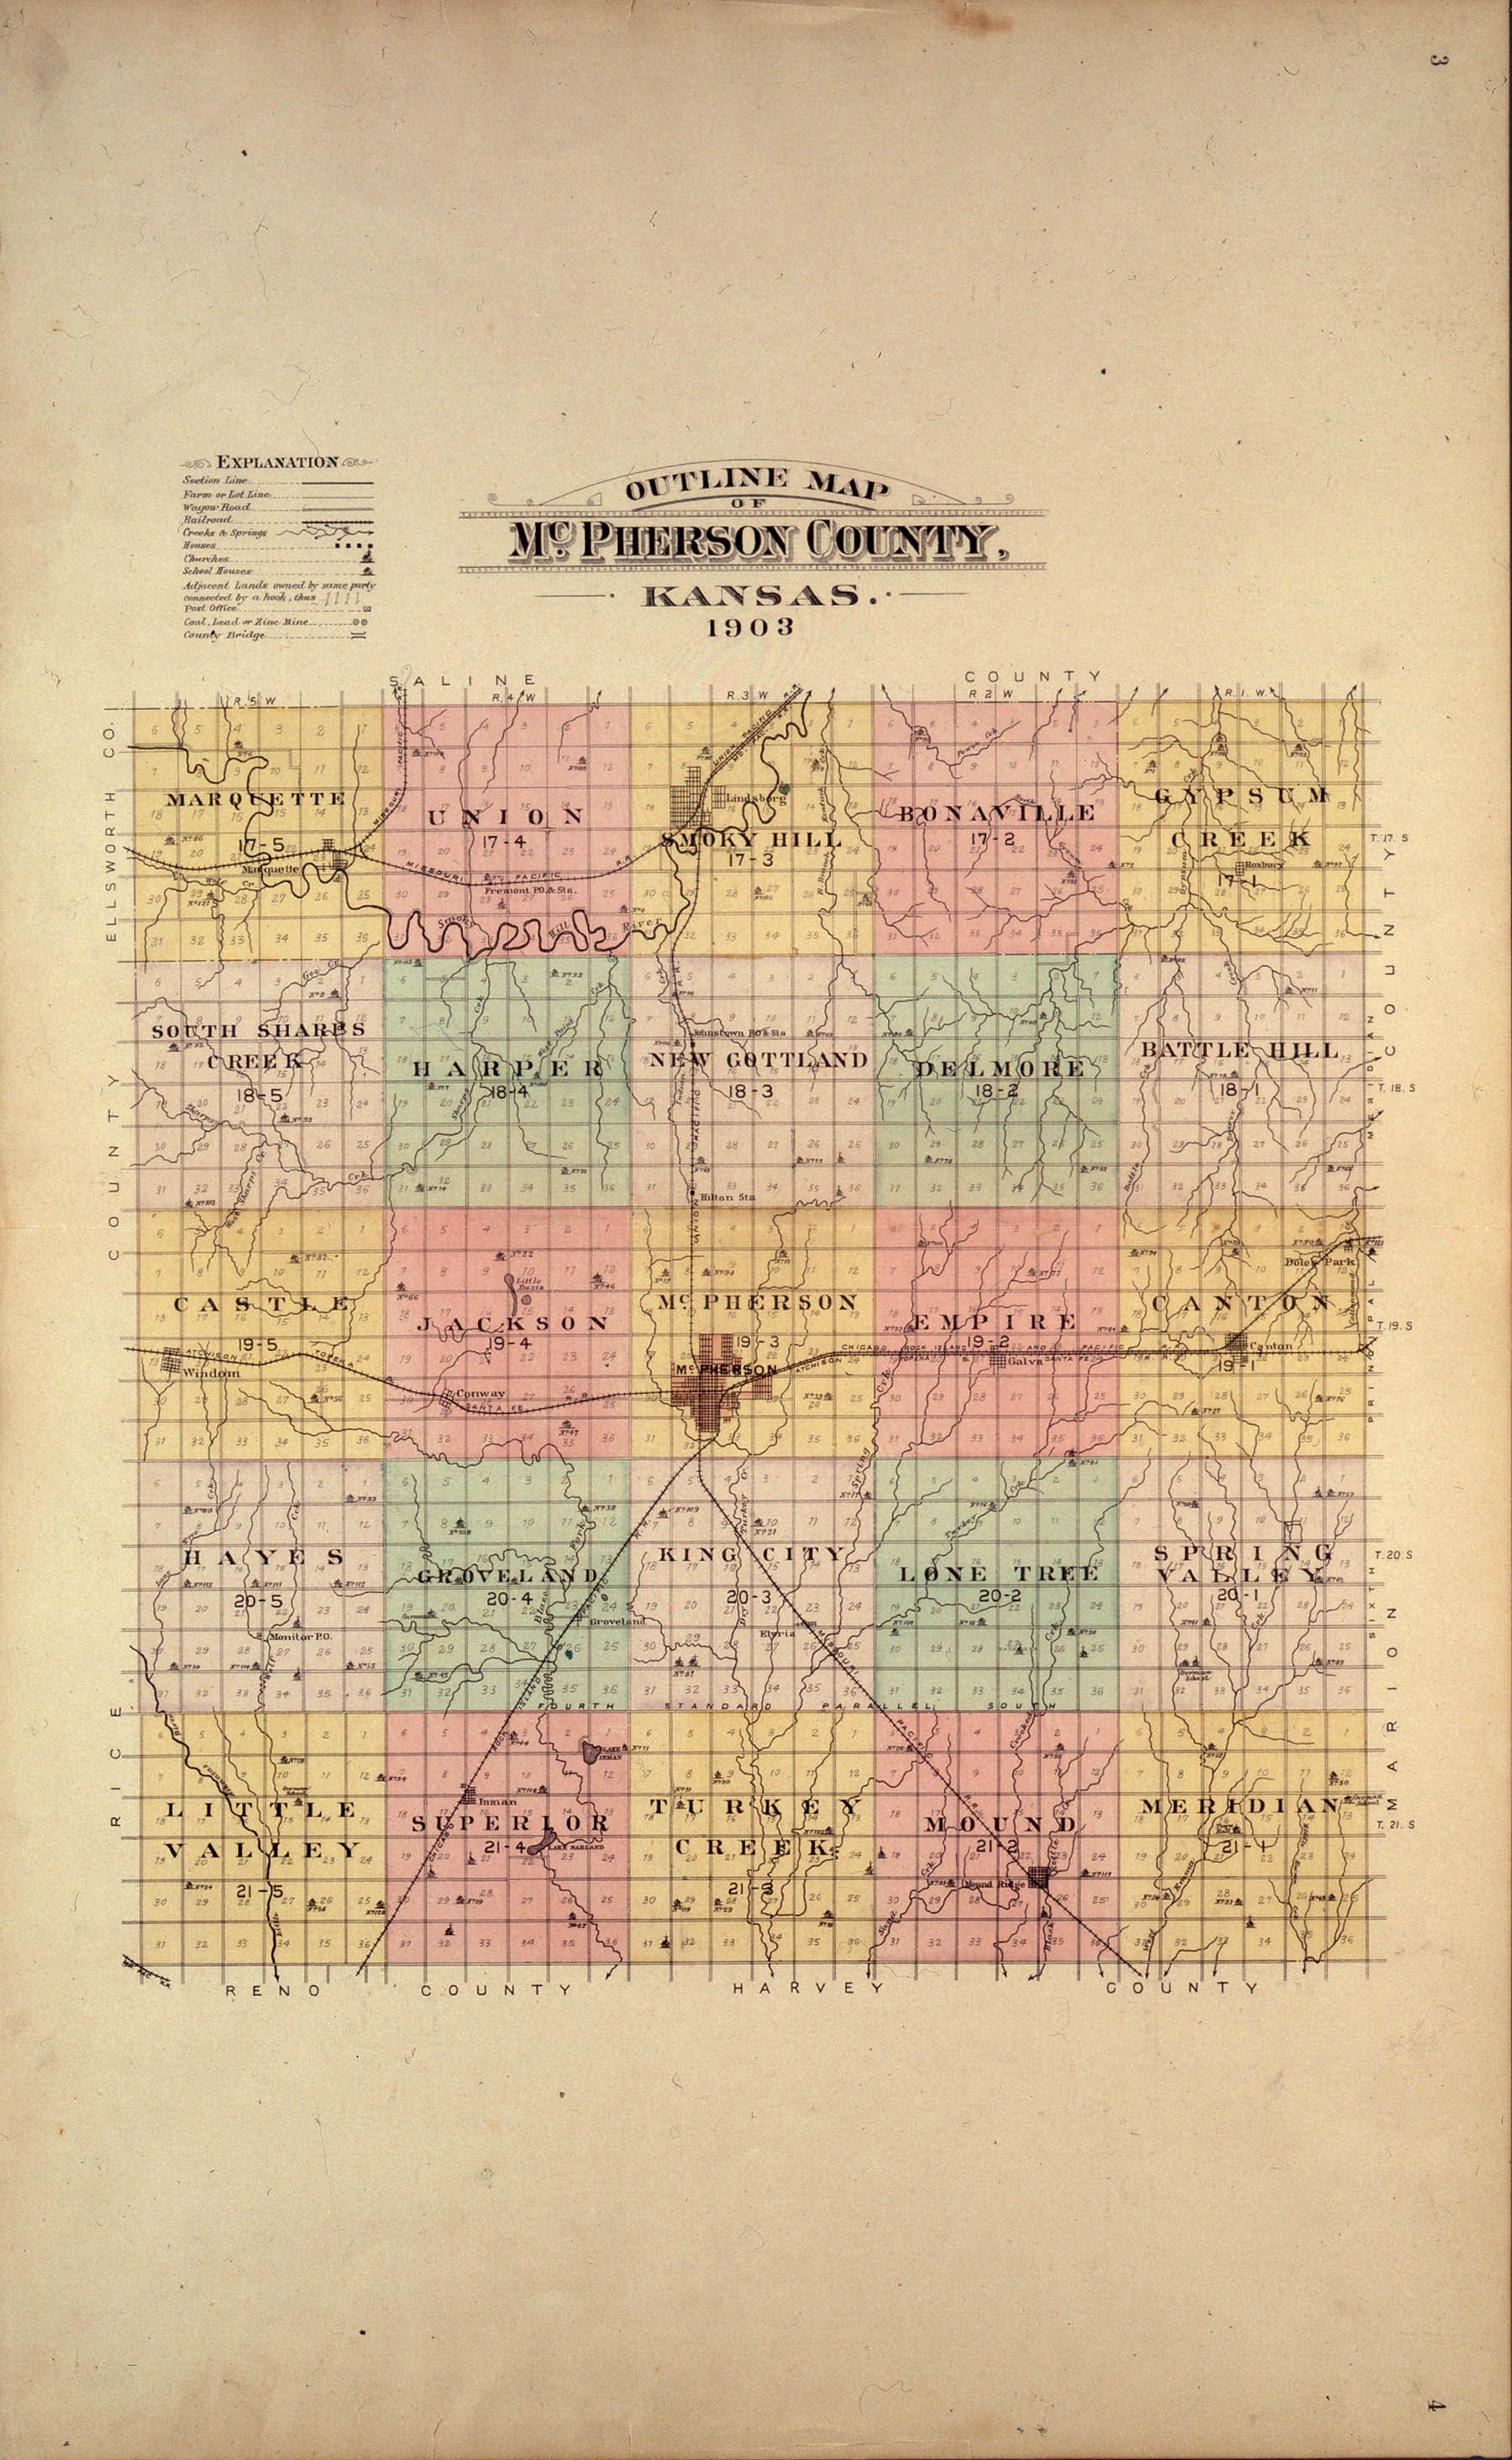 Plat book of McPherson County, Kansas - 3 & 4